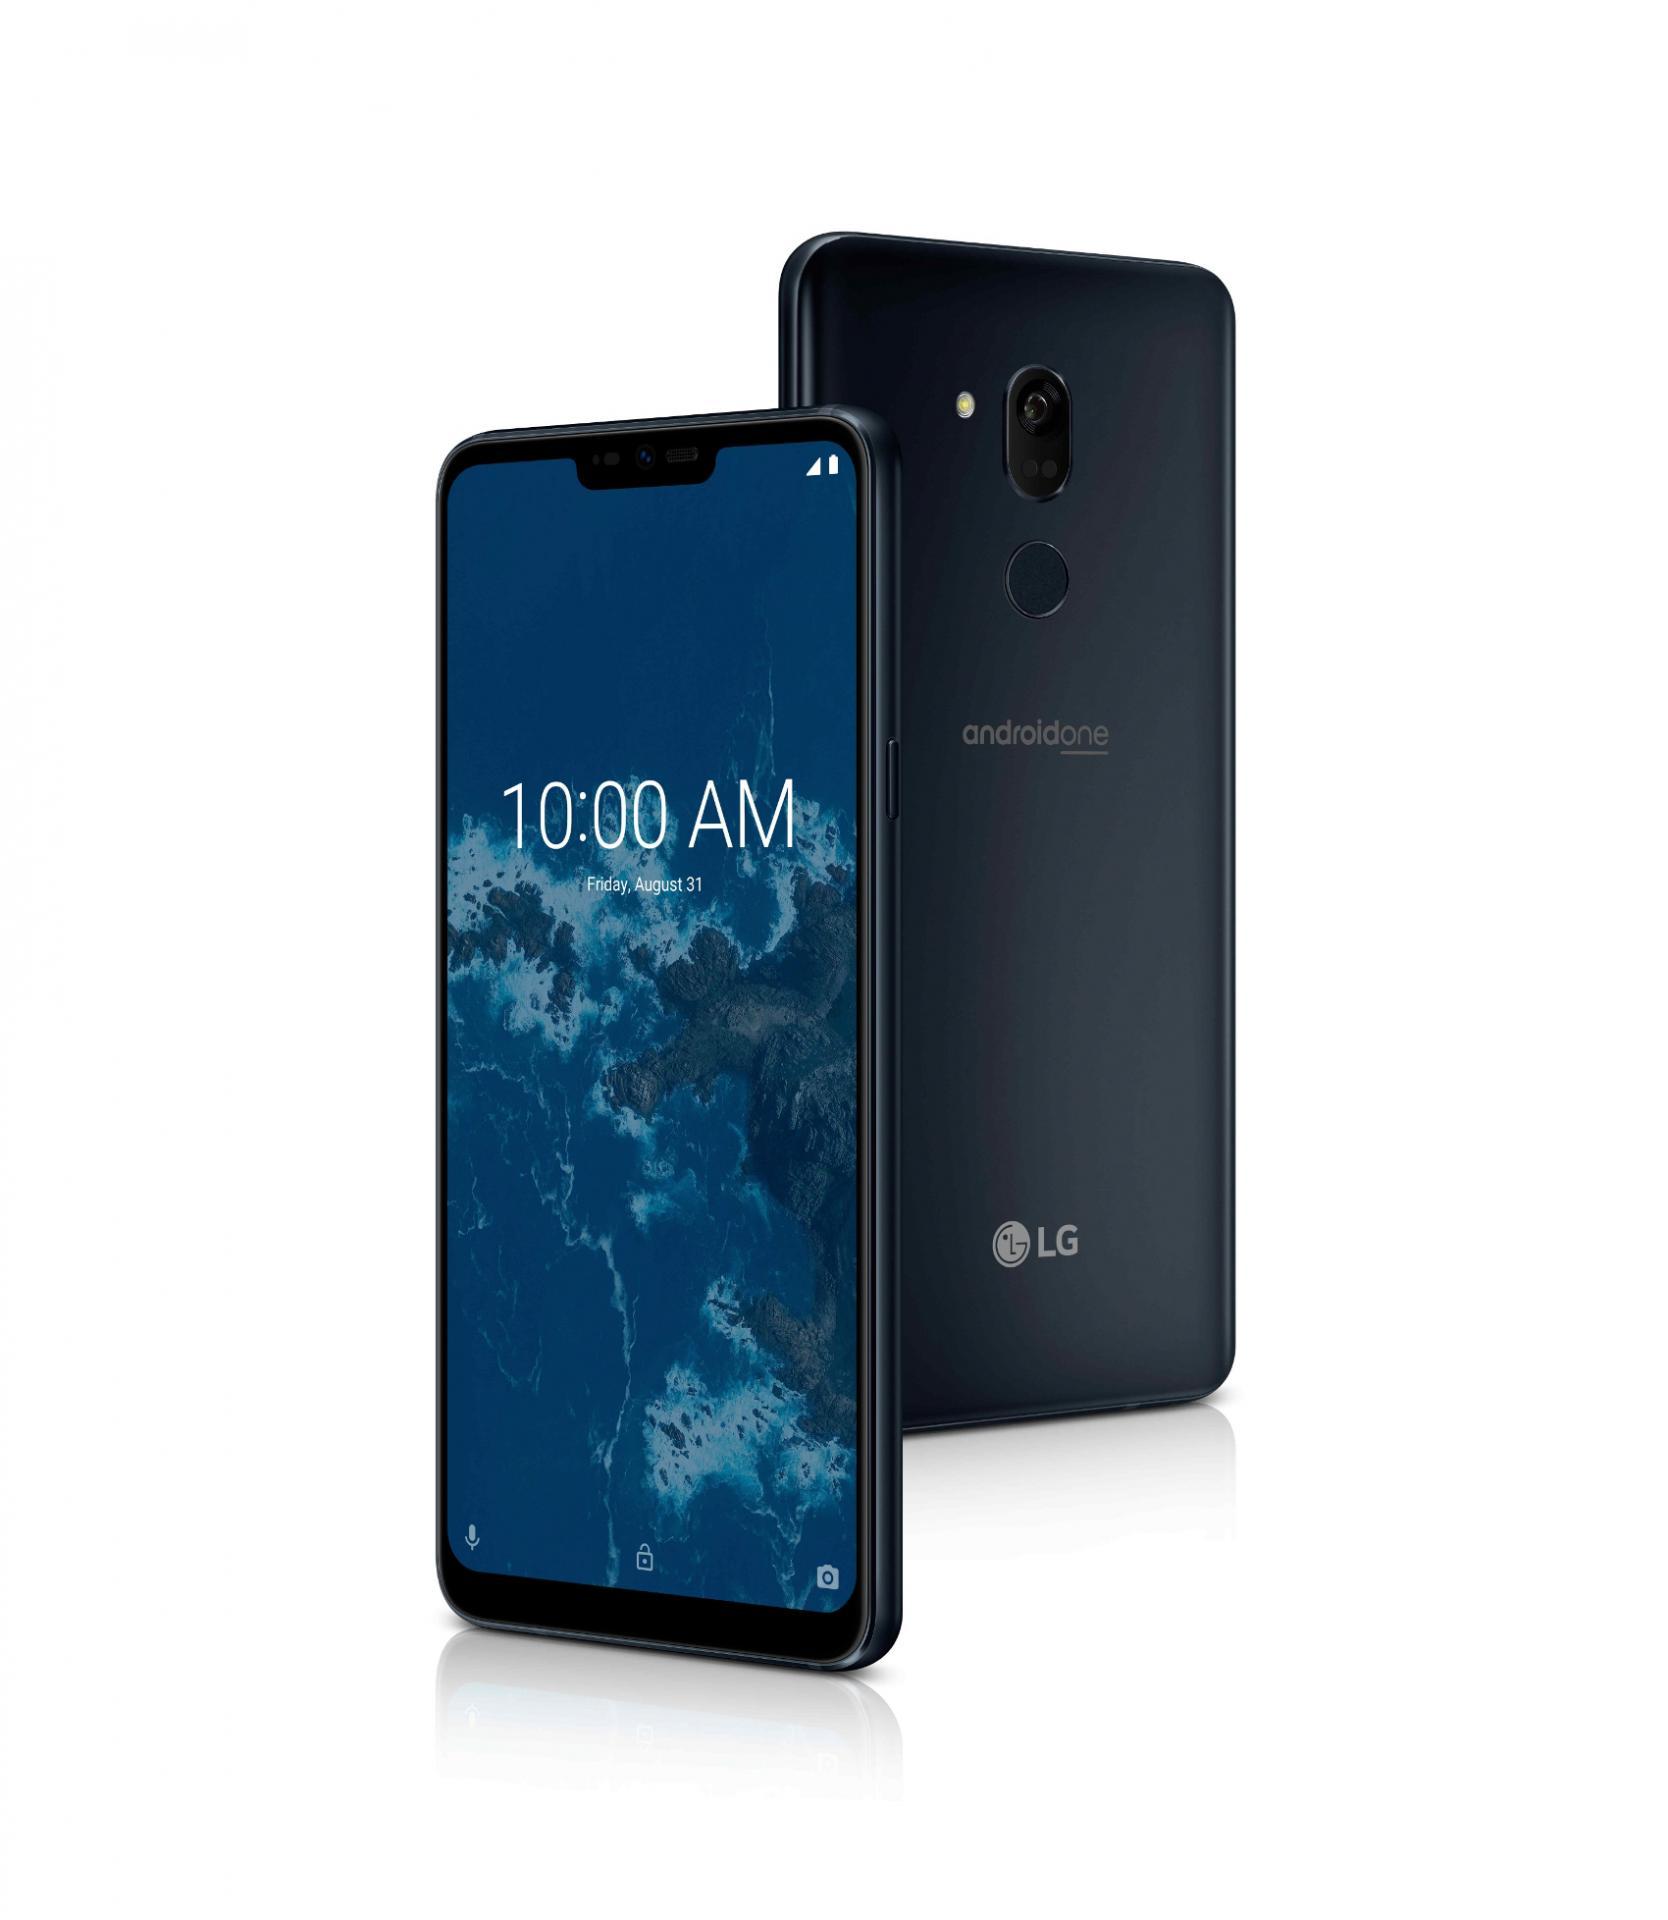 LGзапустила G7 One наAndroid One